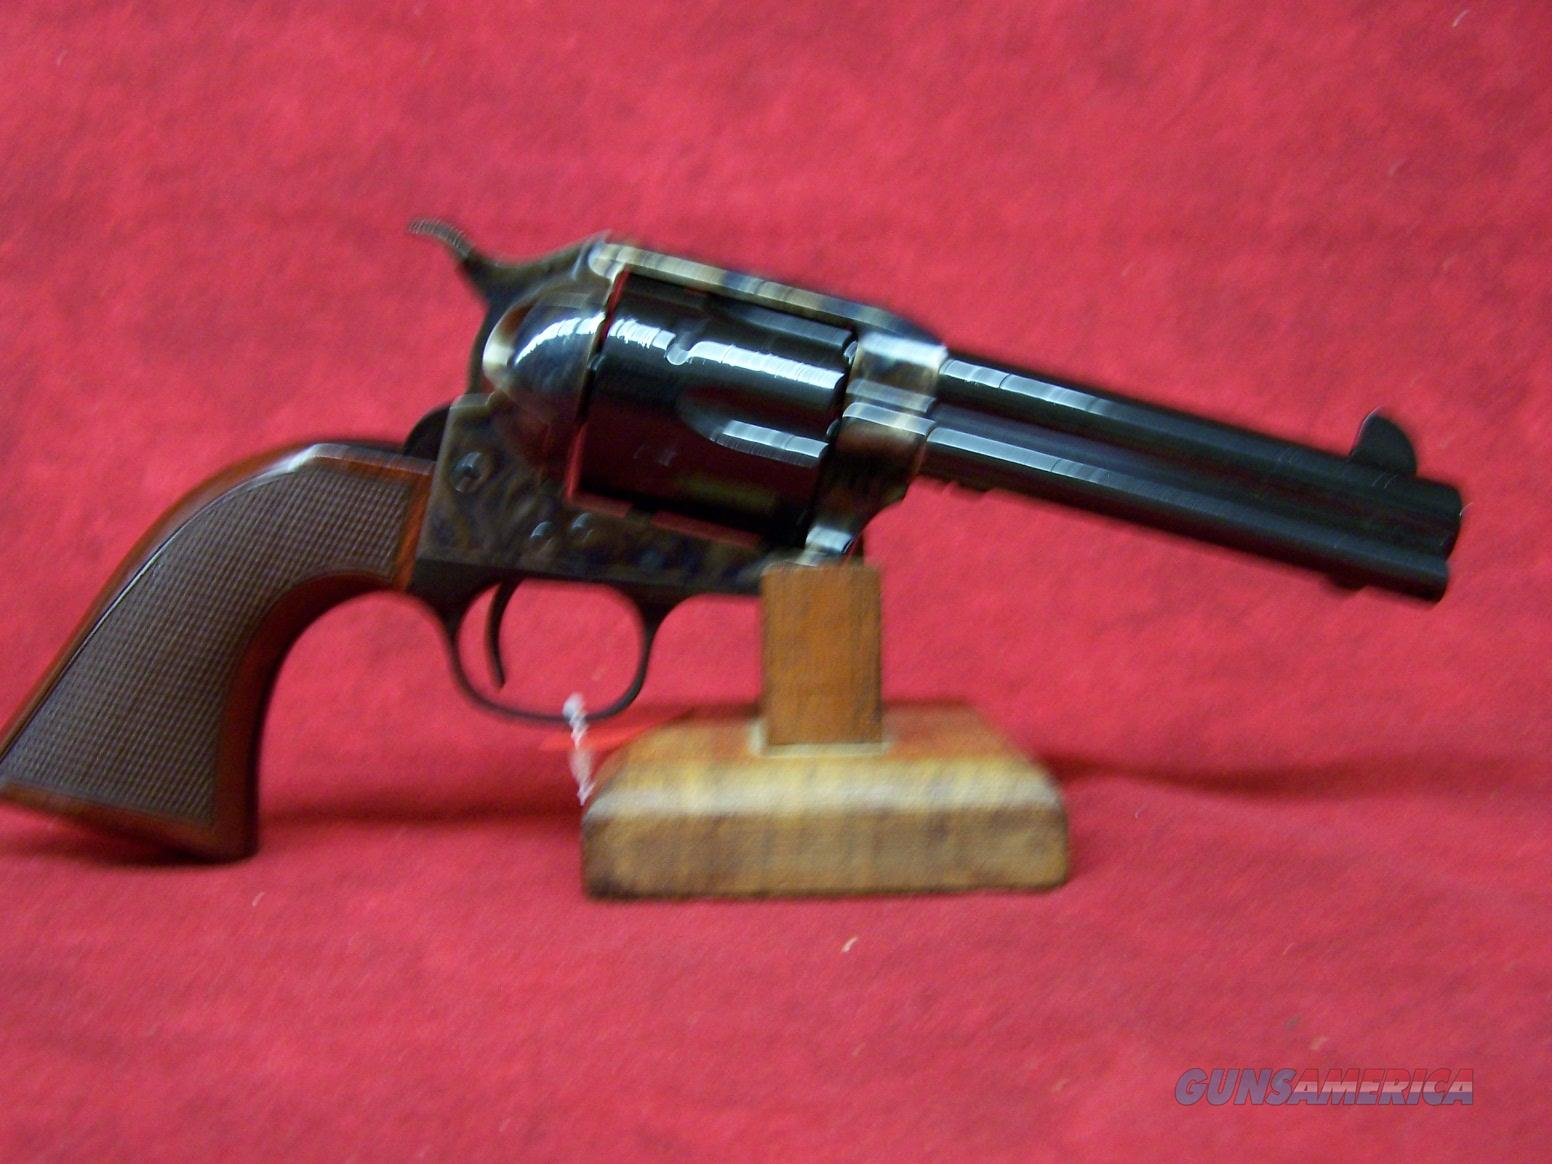 "Uberti 1873 Cattleman II El Patrón Competition 45 ColtRevolver 4.75"" Barrel (345180)  Guns > Pistols > Uberti Pistols > Ctg."